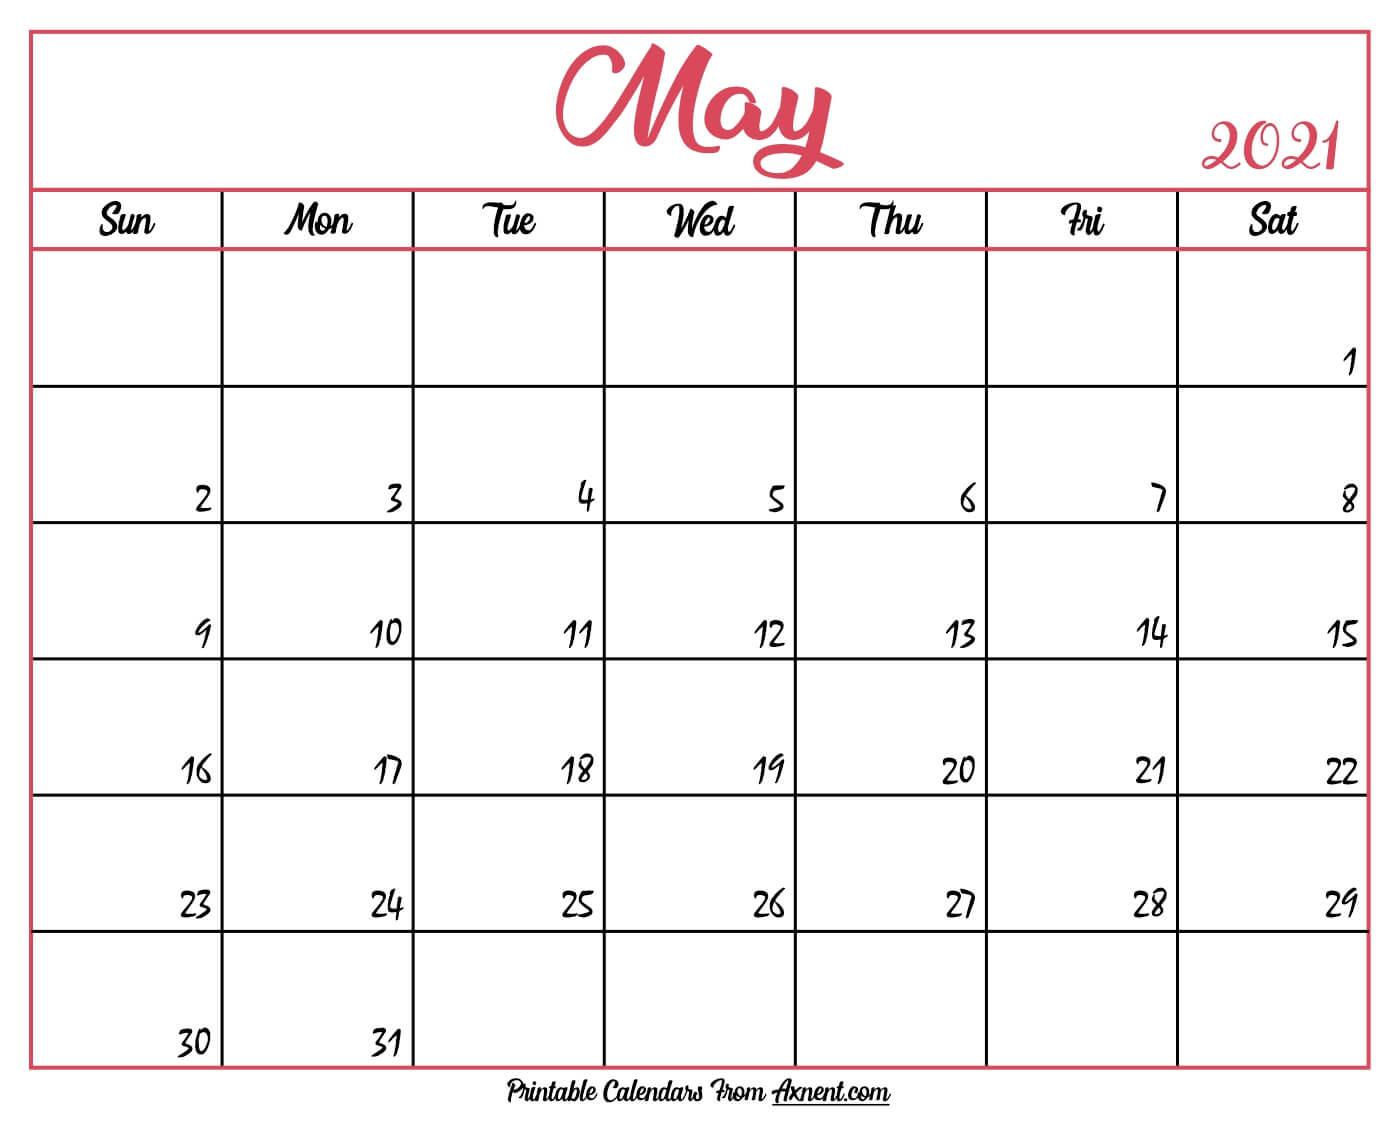 Printable May 2021 Calendar Template - Print Now-2021 Calendar Fillable